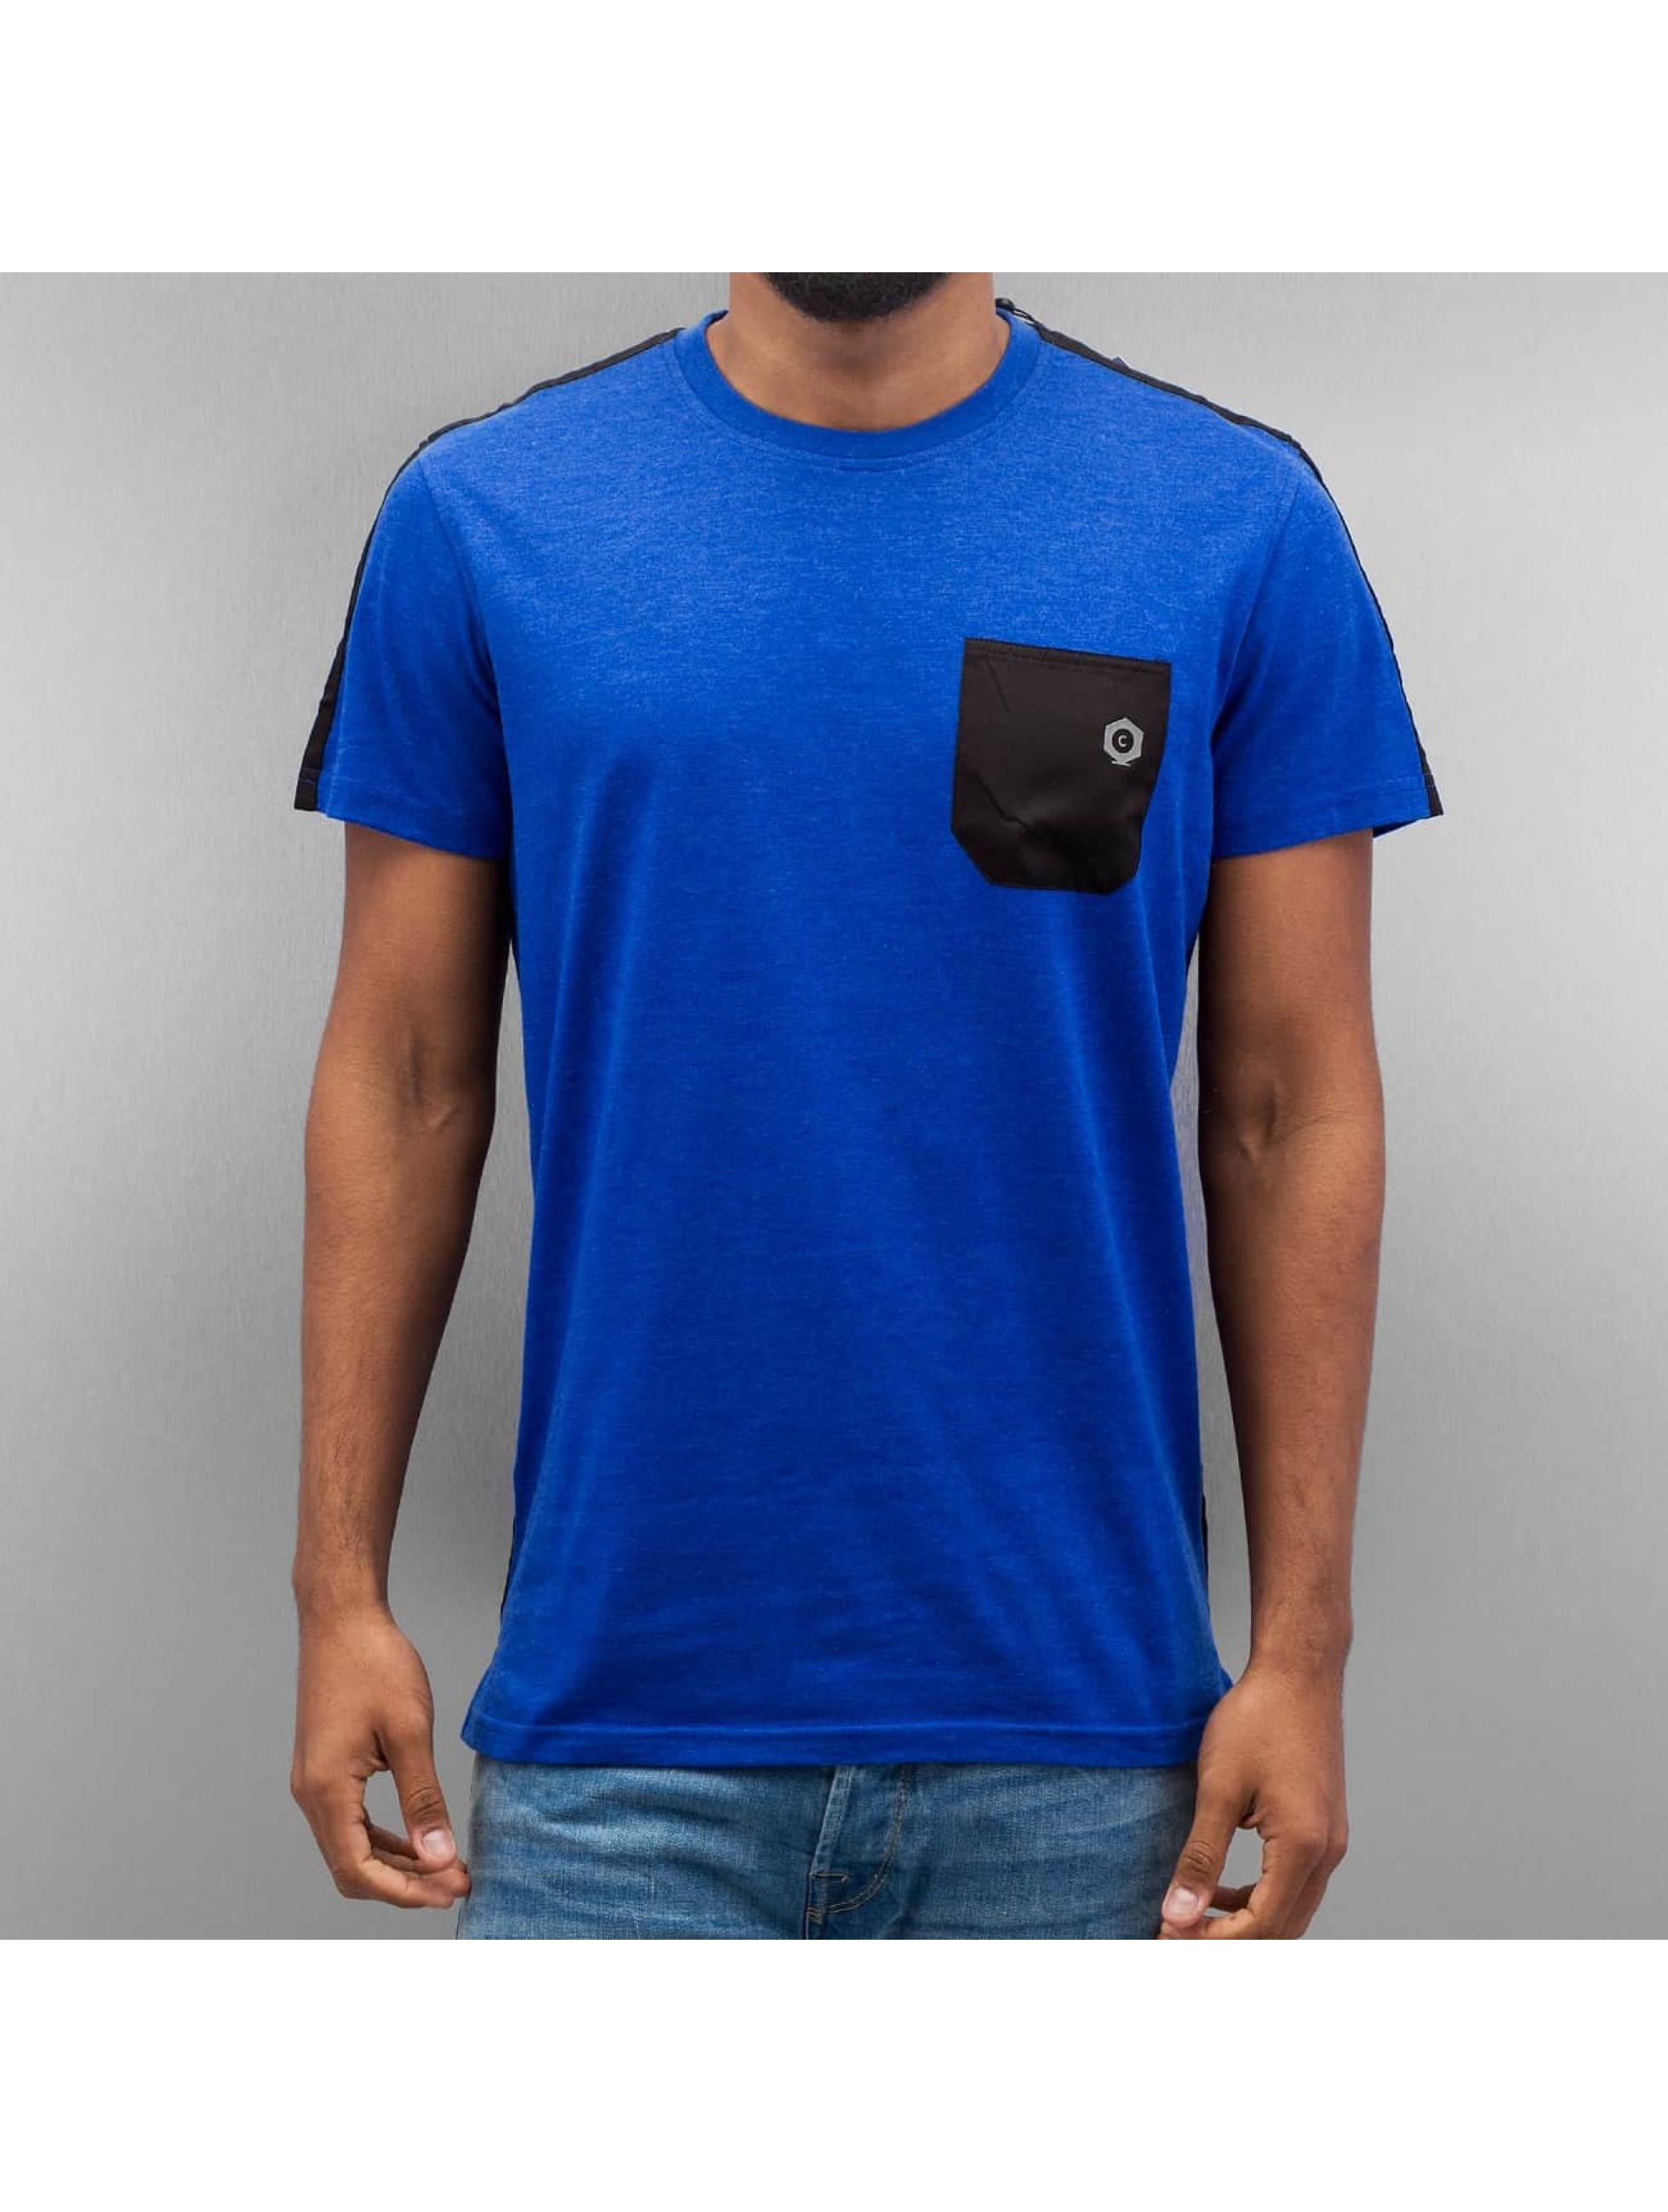 Jack & Jones t-shirt jjcoBlackfriars blauw